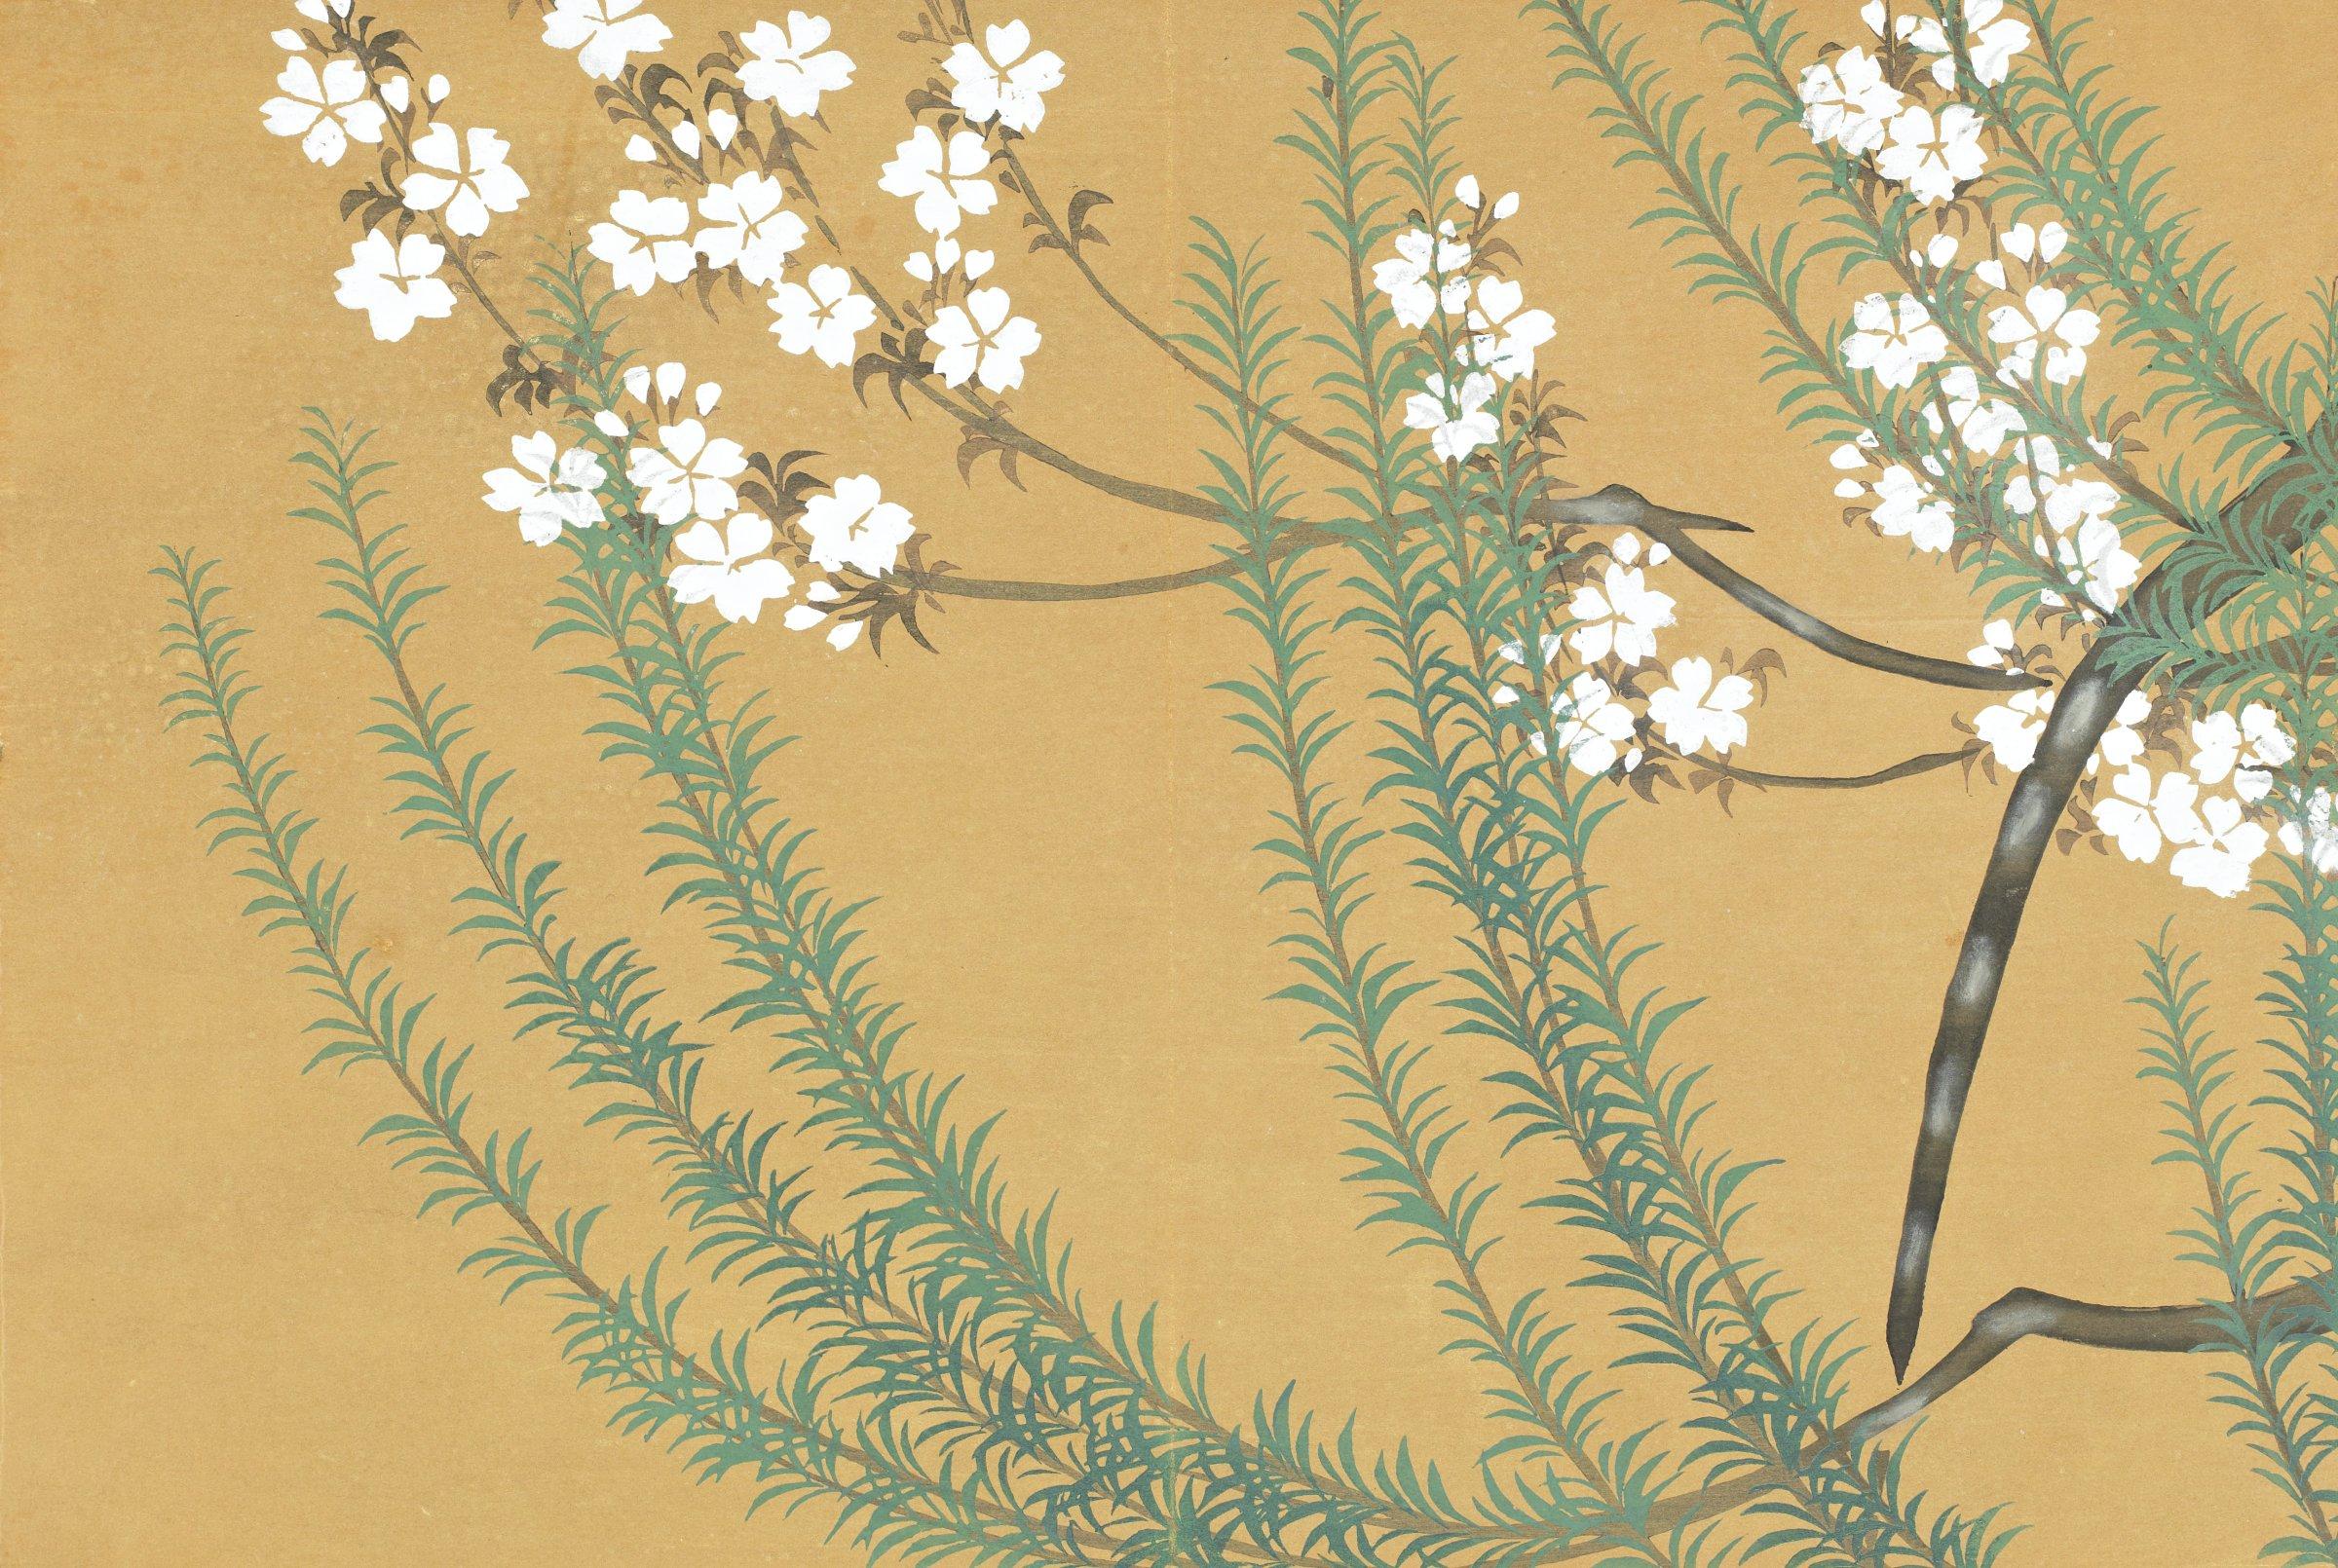 Yanagi, Sakura (Willow Trees and Cherry Blossoms), from Momoyogusa (A World of Things), Volume 2, Kamisaka Sekka, ink and color on paper